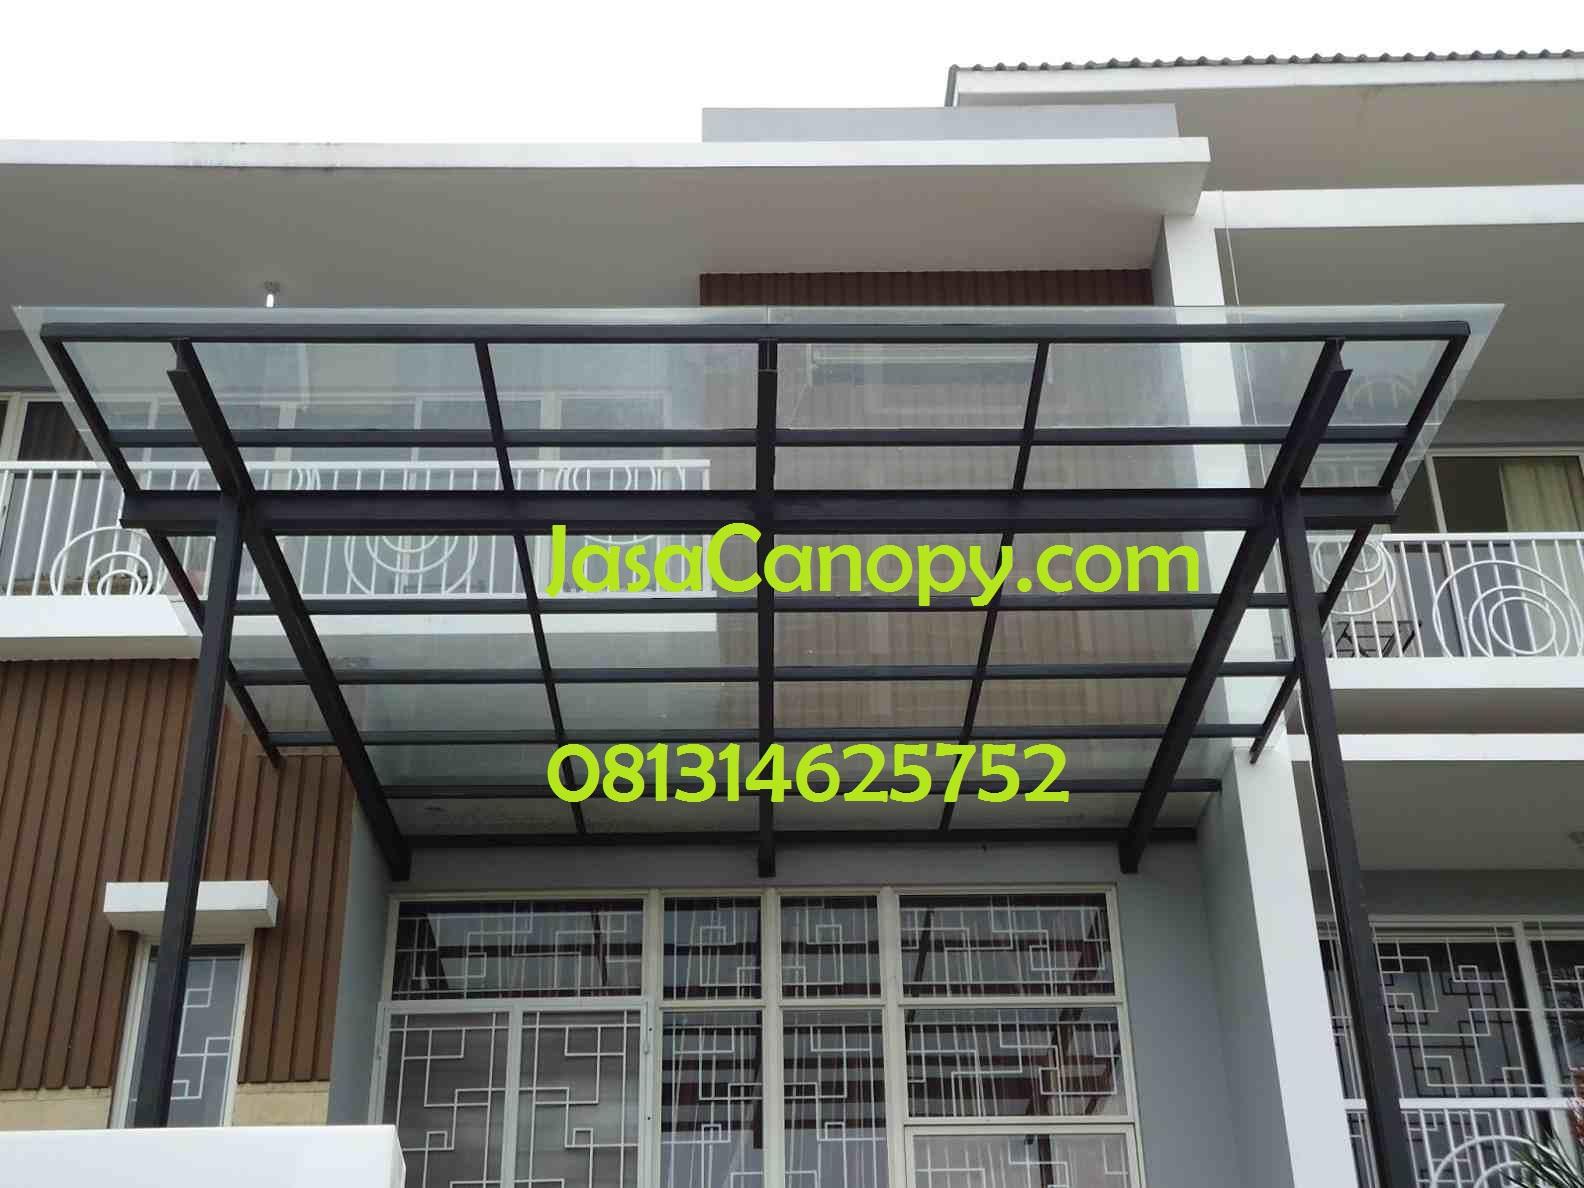 Model Kanopi  Minimalis  2019 Jasa Canopy Murah Jakarta